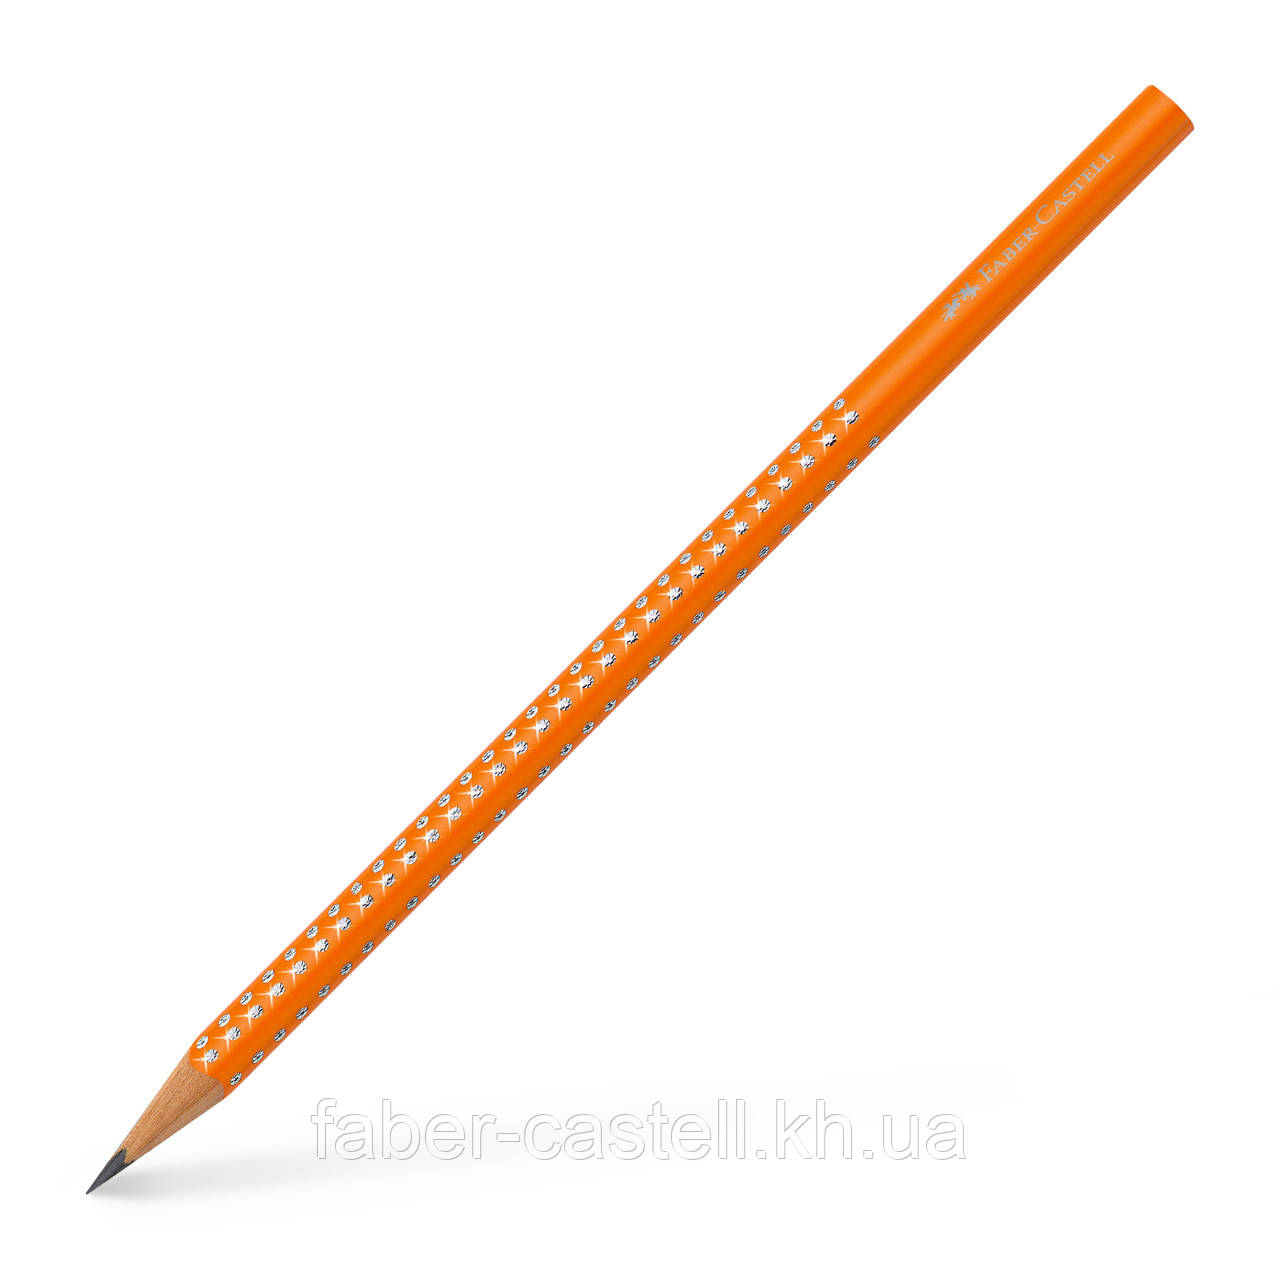 Карандаш чернографитный Faber-Castell Grip Sparkle корпус оранжевый, 118318